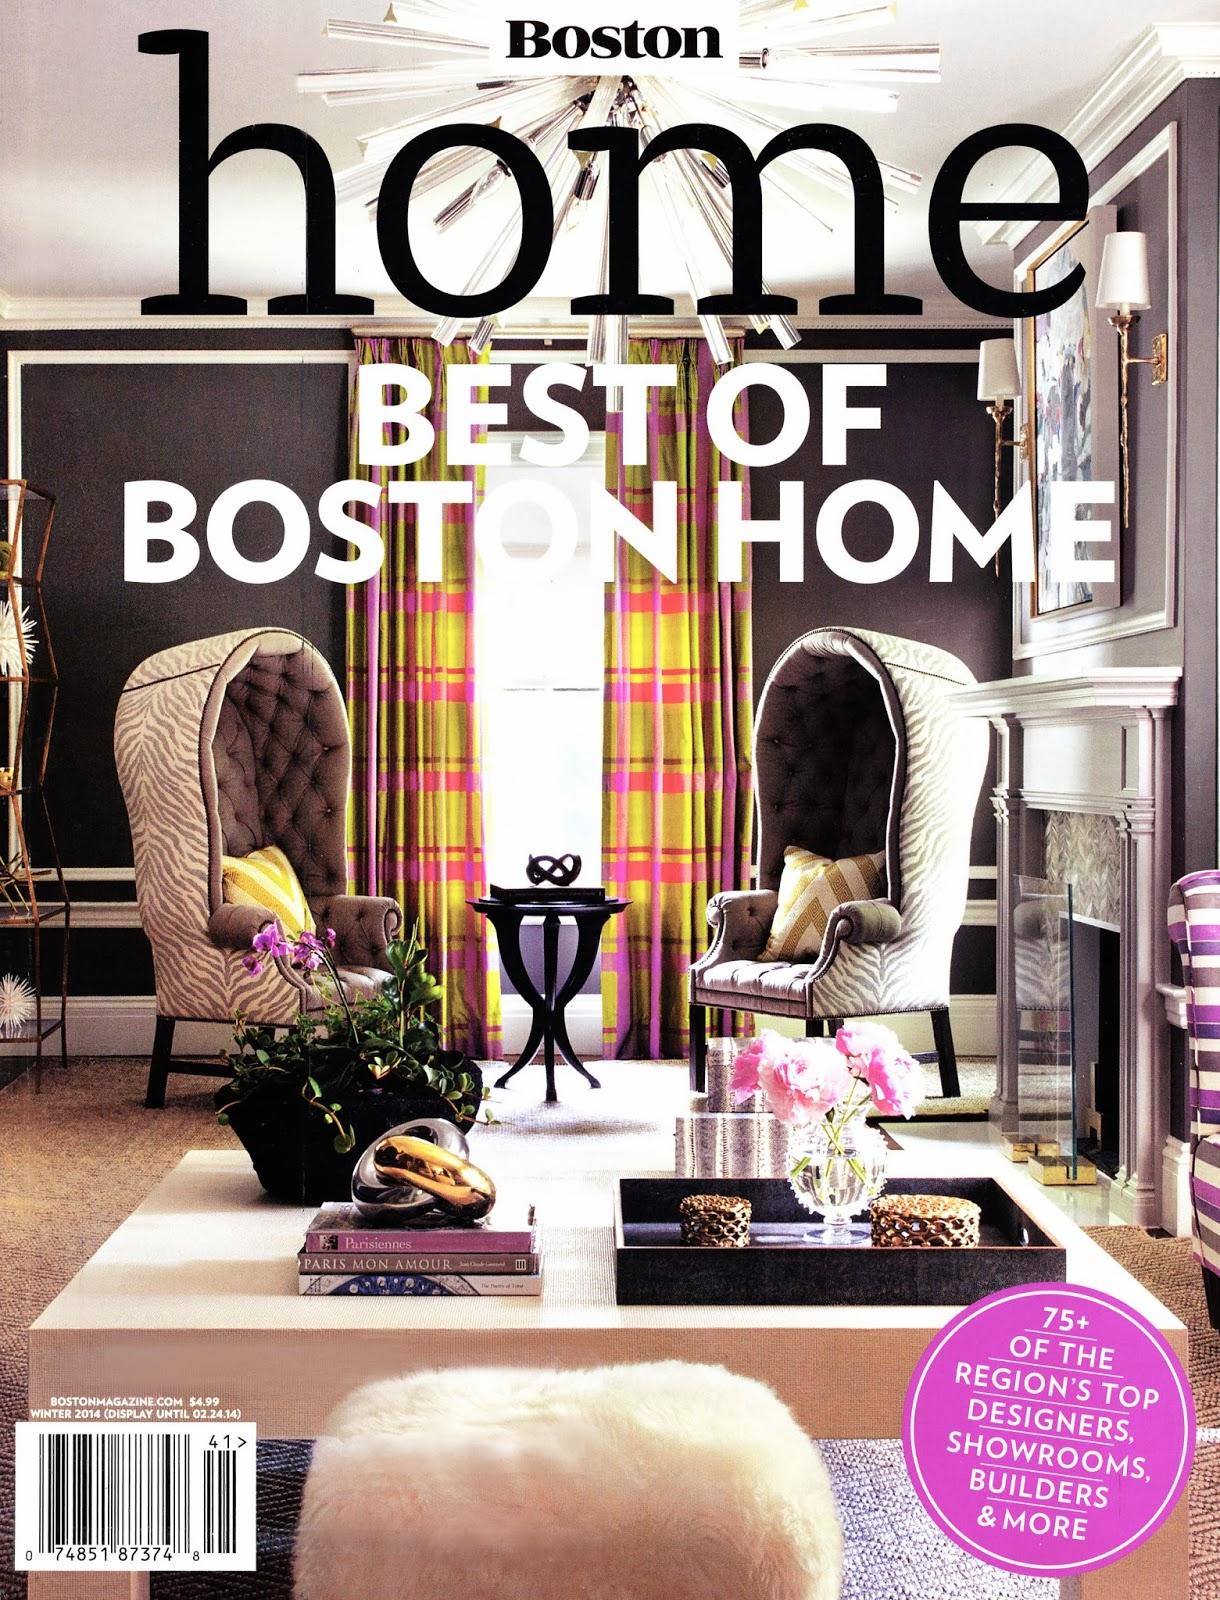 Boston Home Magazine January 2014